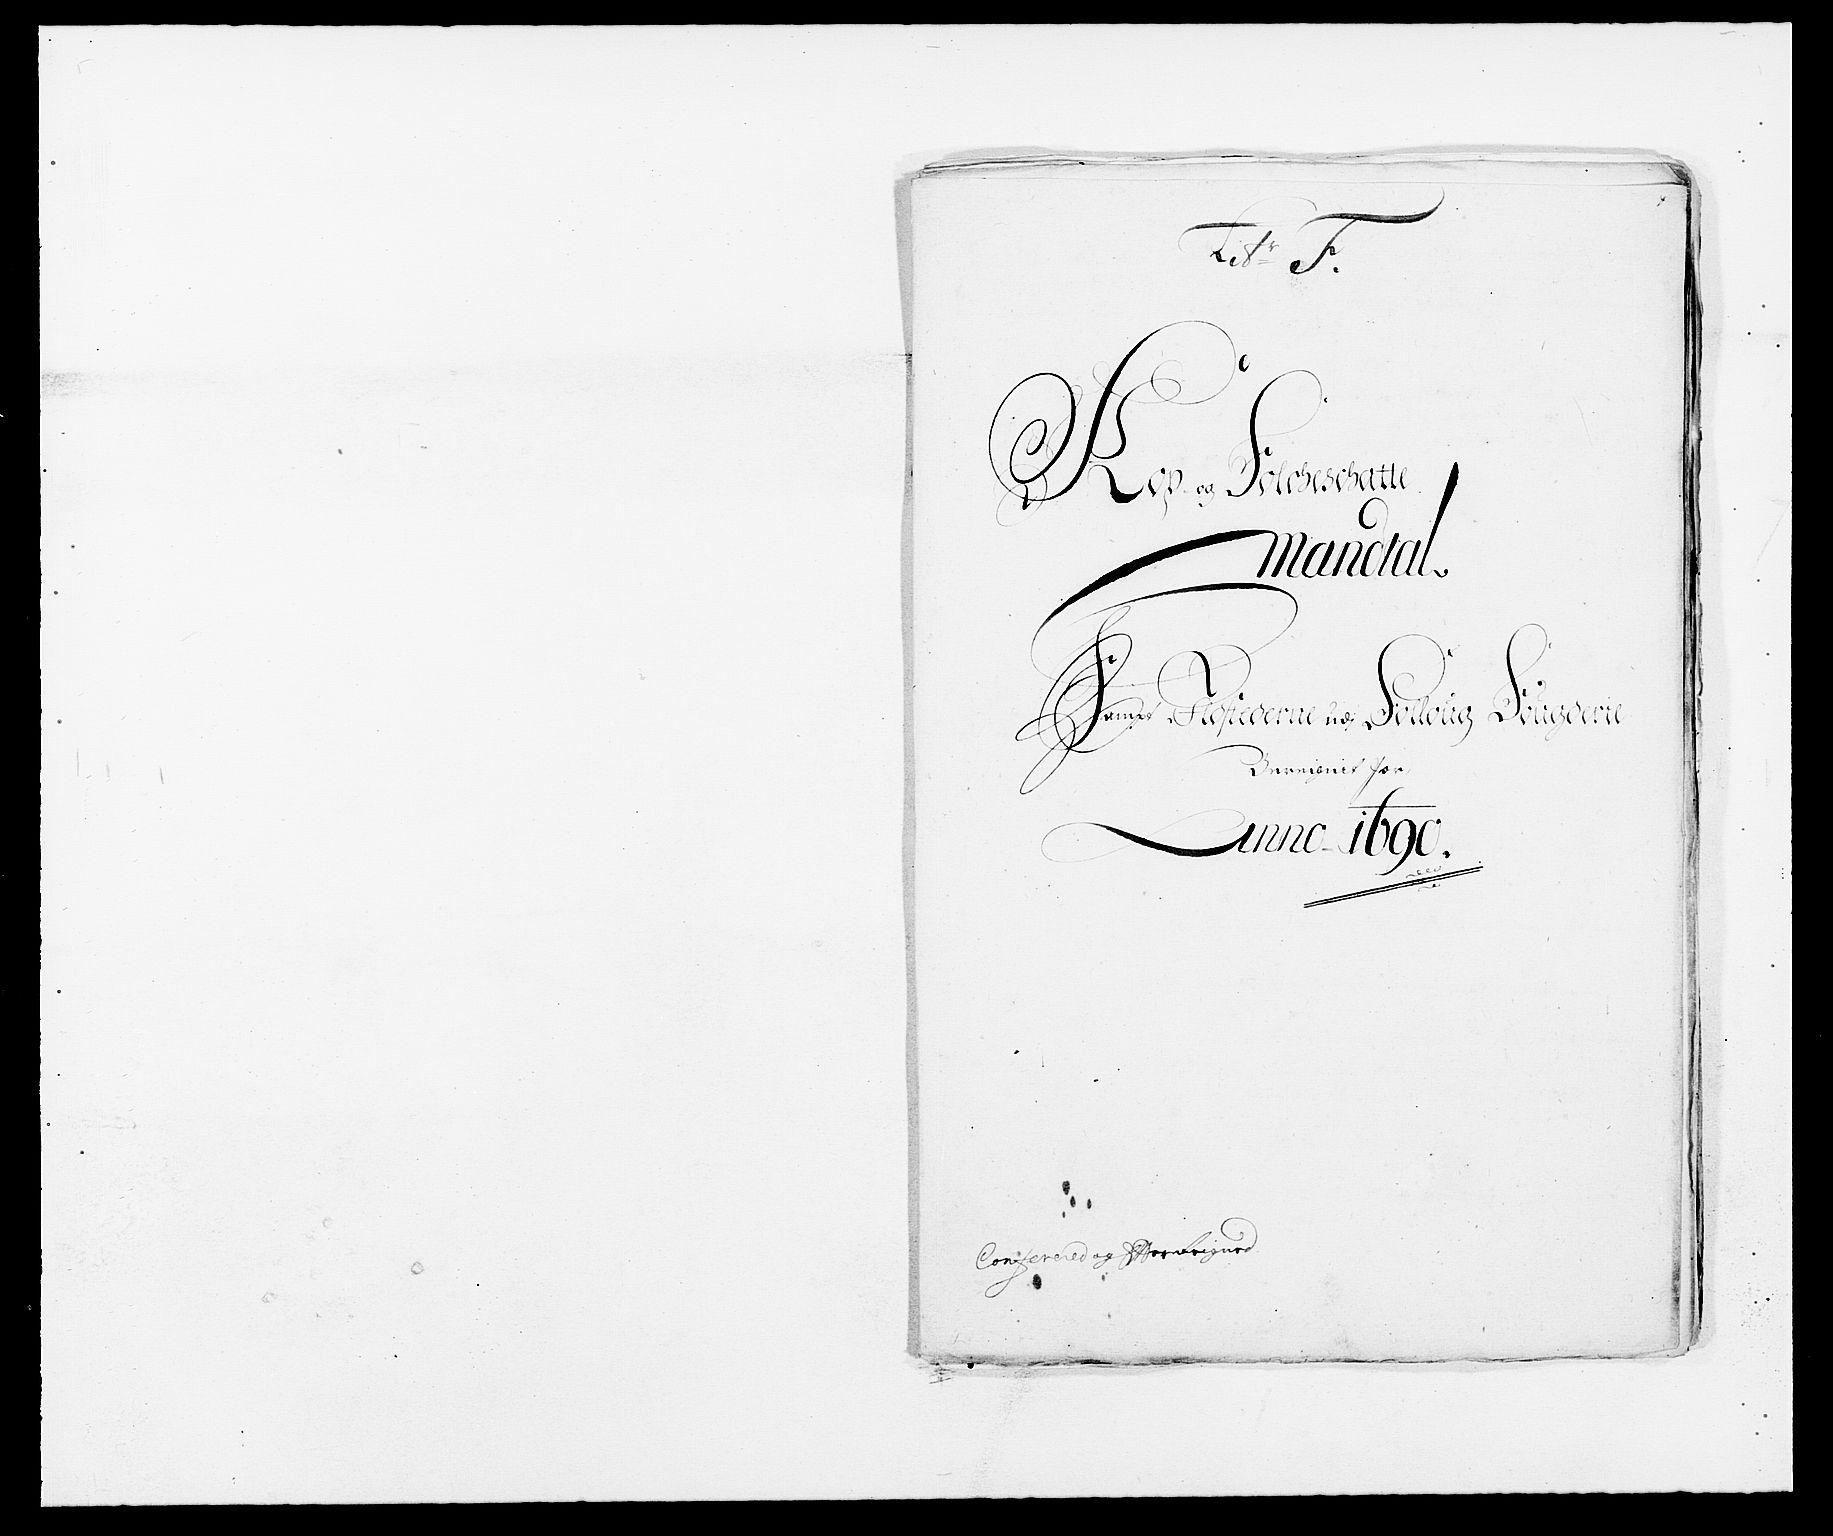 RA, Rentekammeret inntil 1814, Reviderte regnskaper, Fogderegnskap, R09/L0435: Fogderegnskap Follo, 1689-1691, s. 374